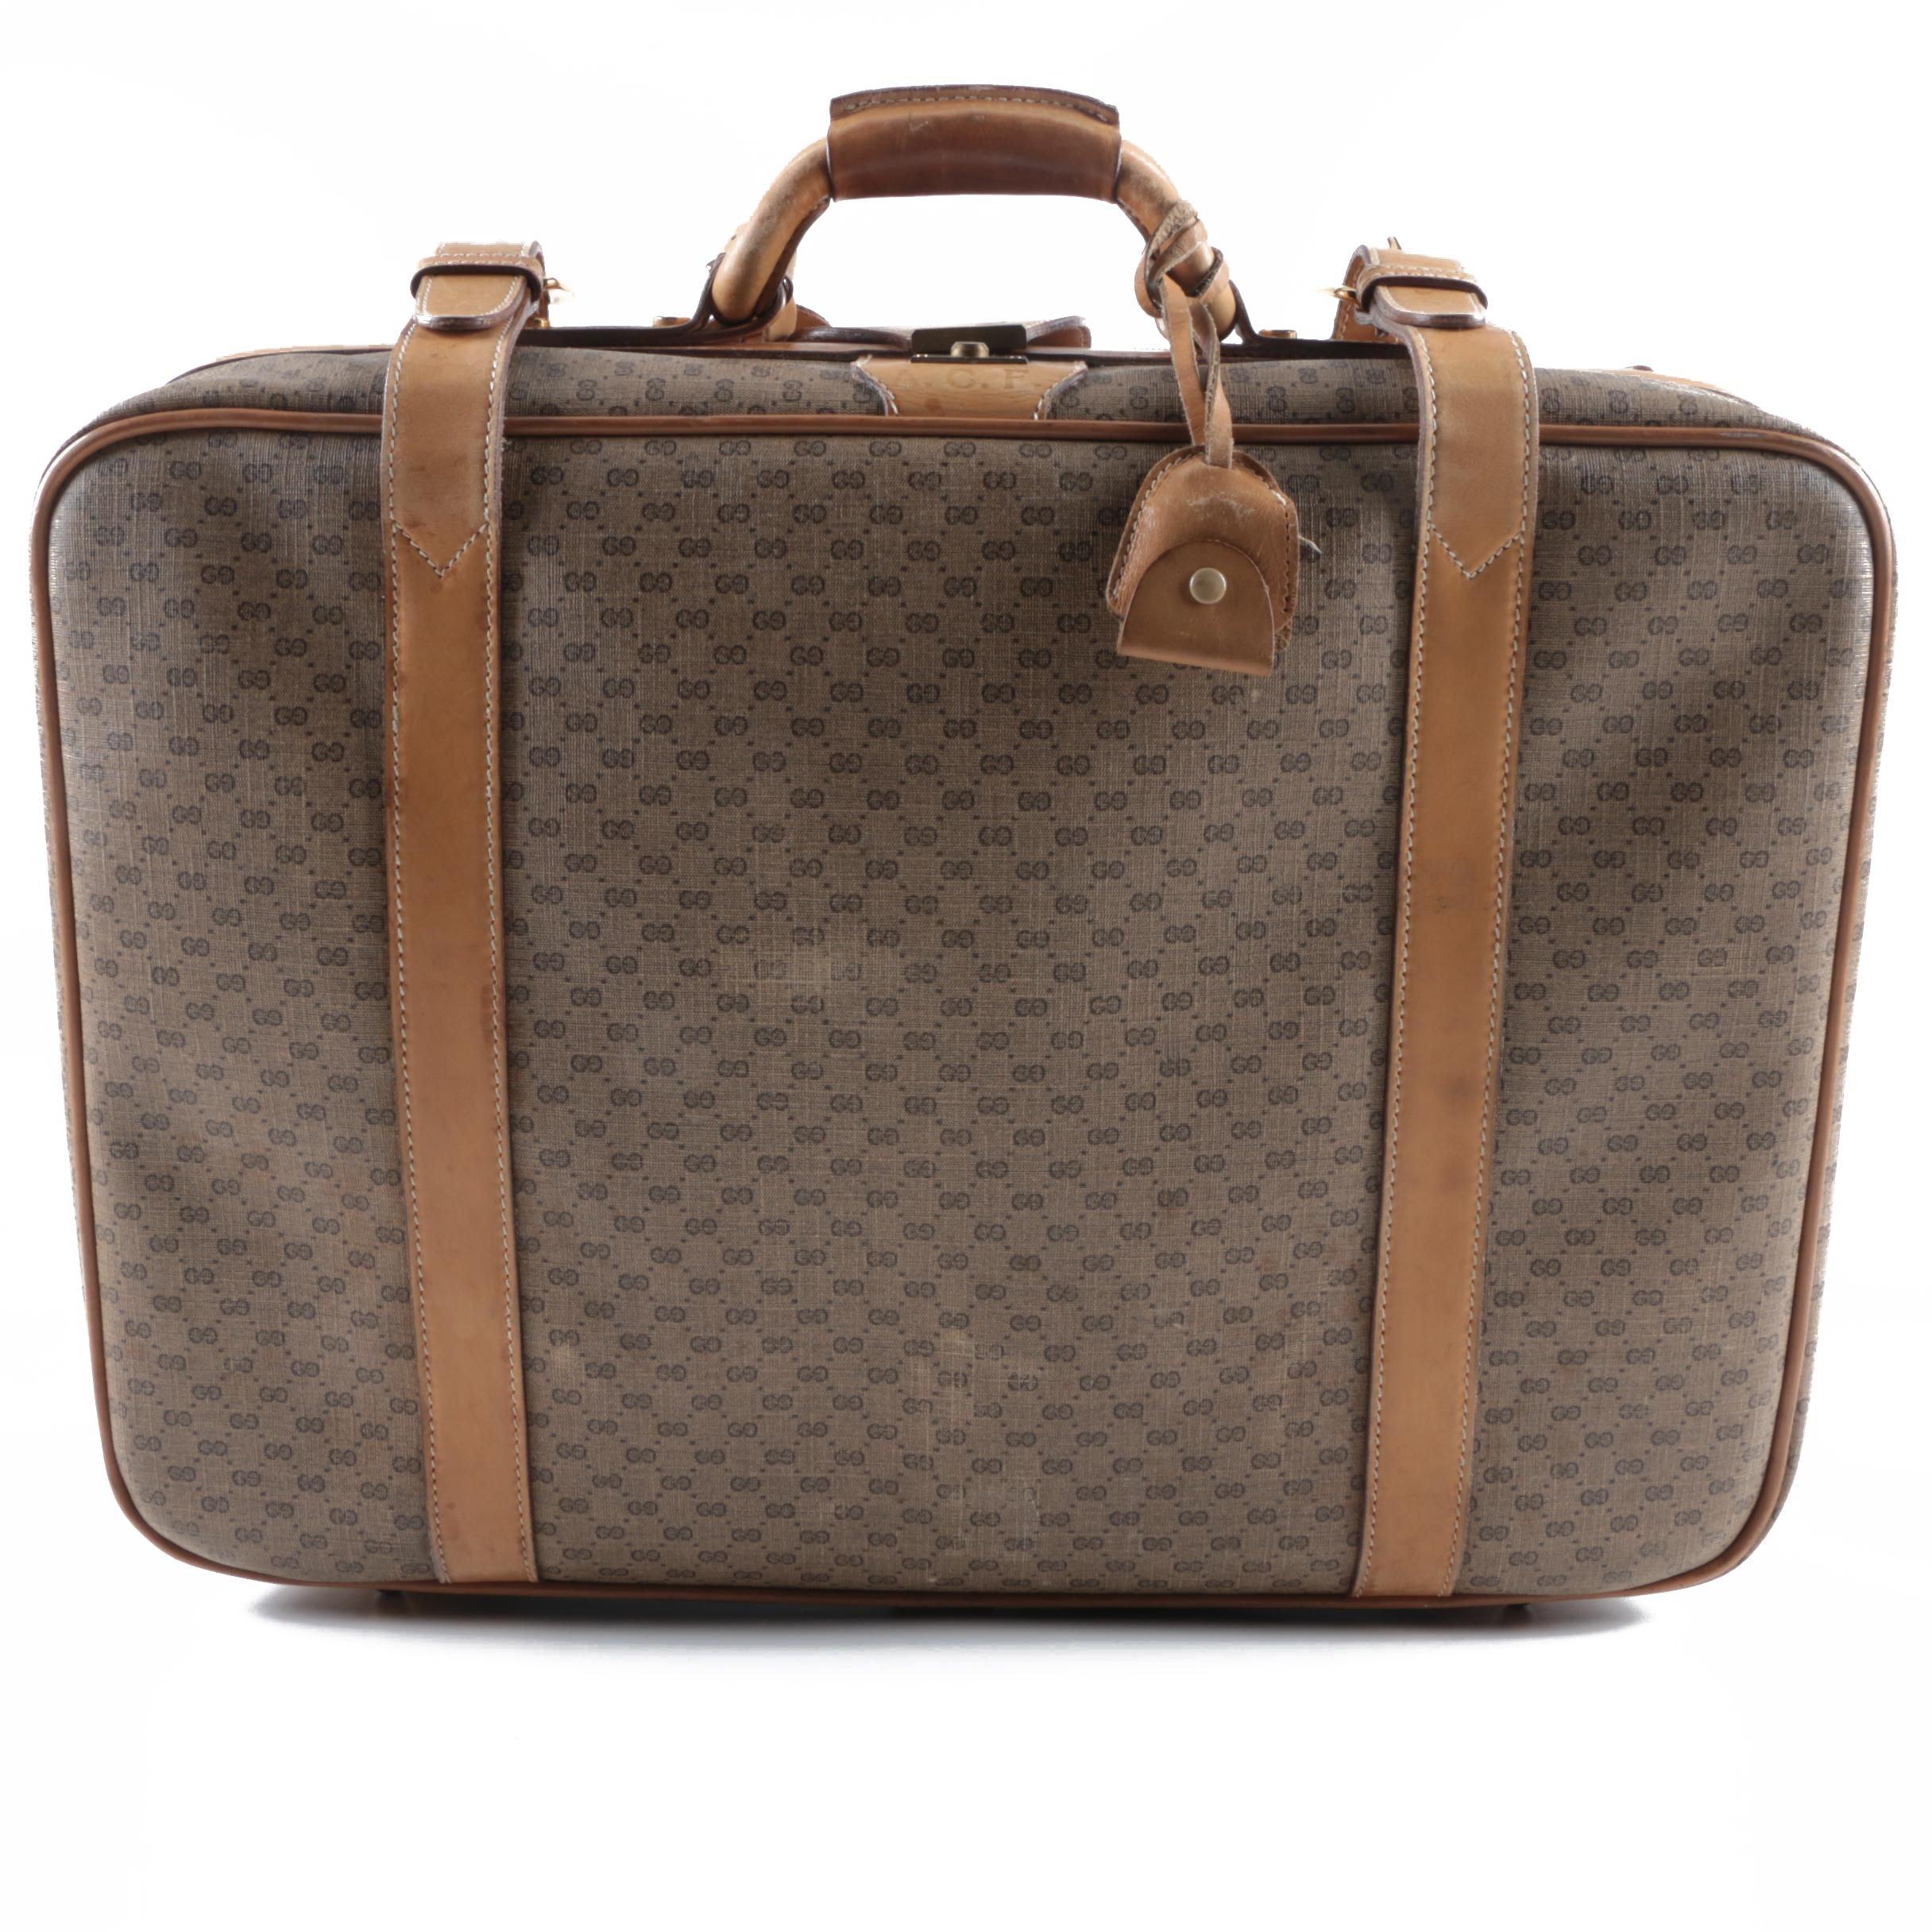 Vintage Gucci Monogram Canvas Suitcase